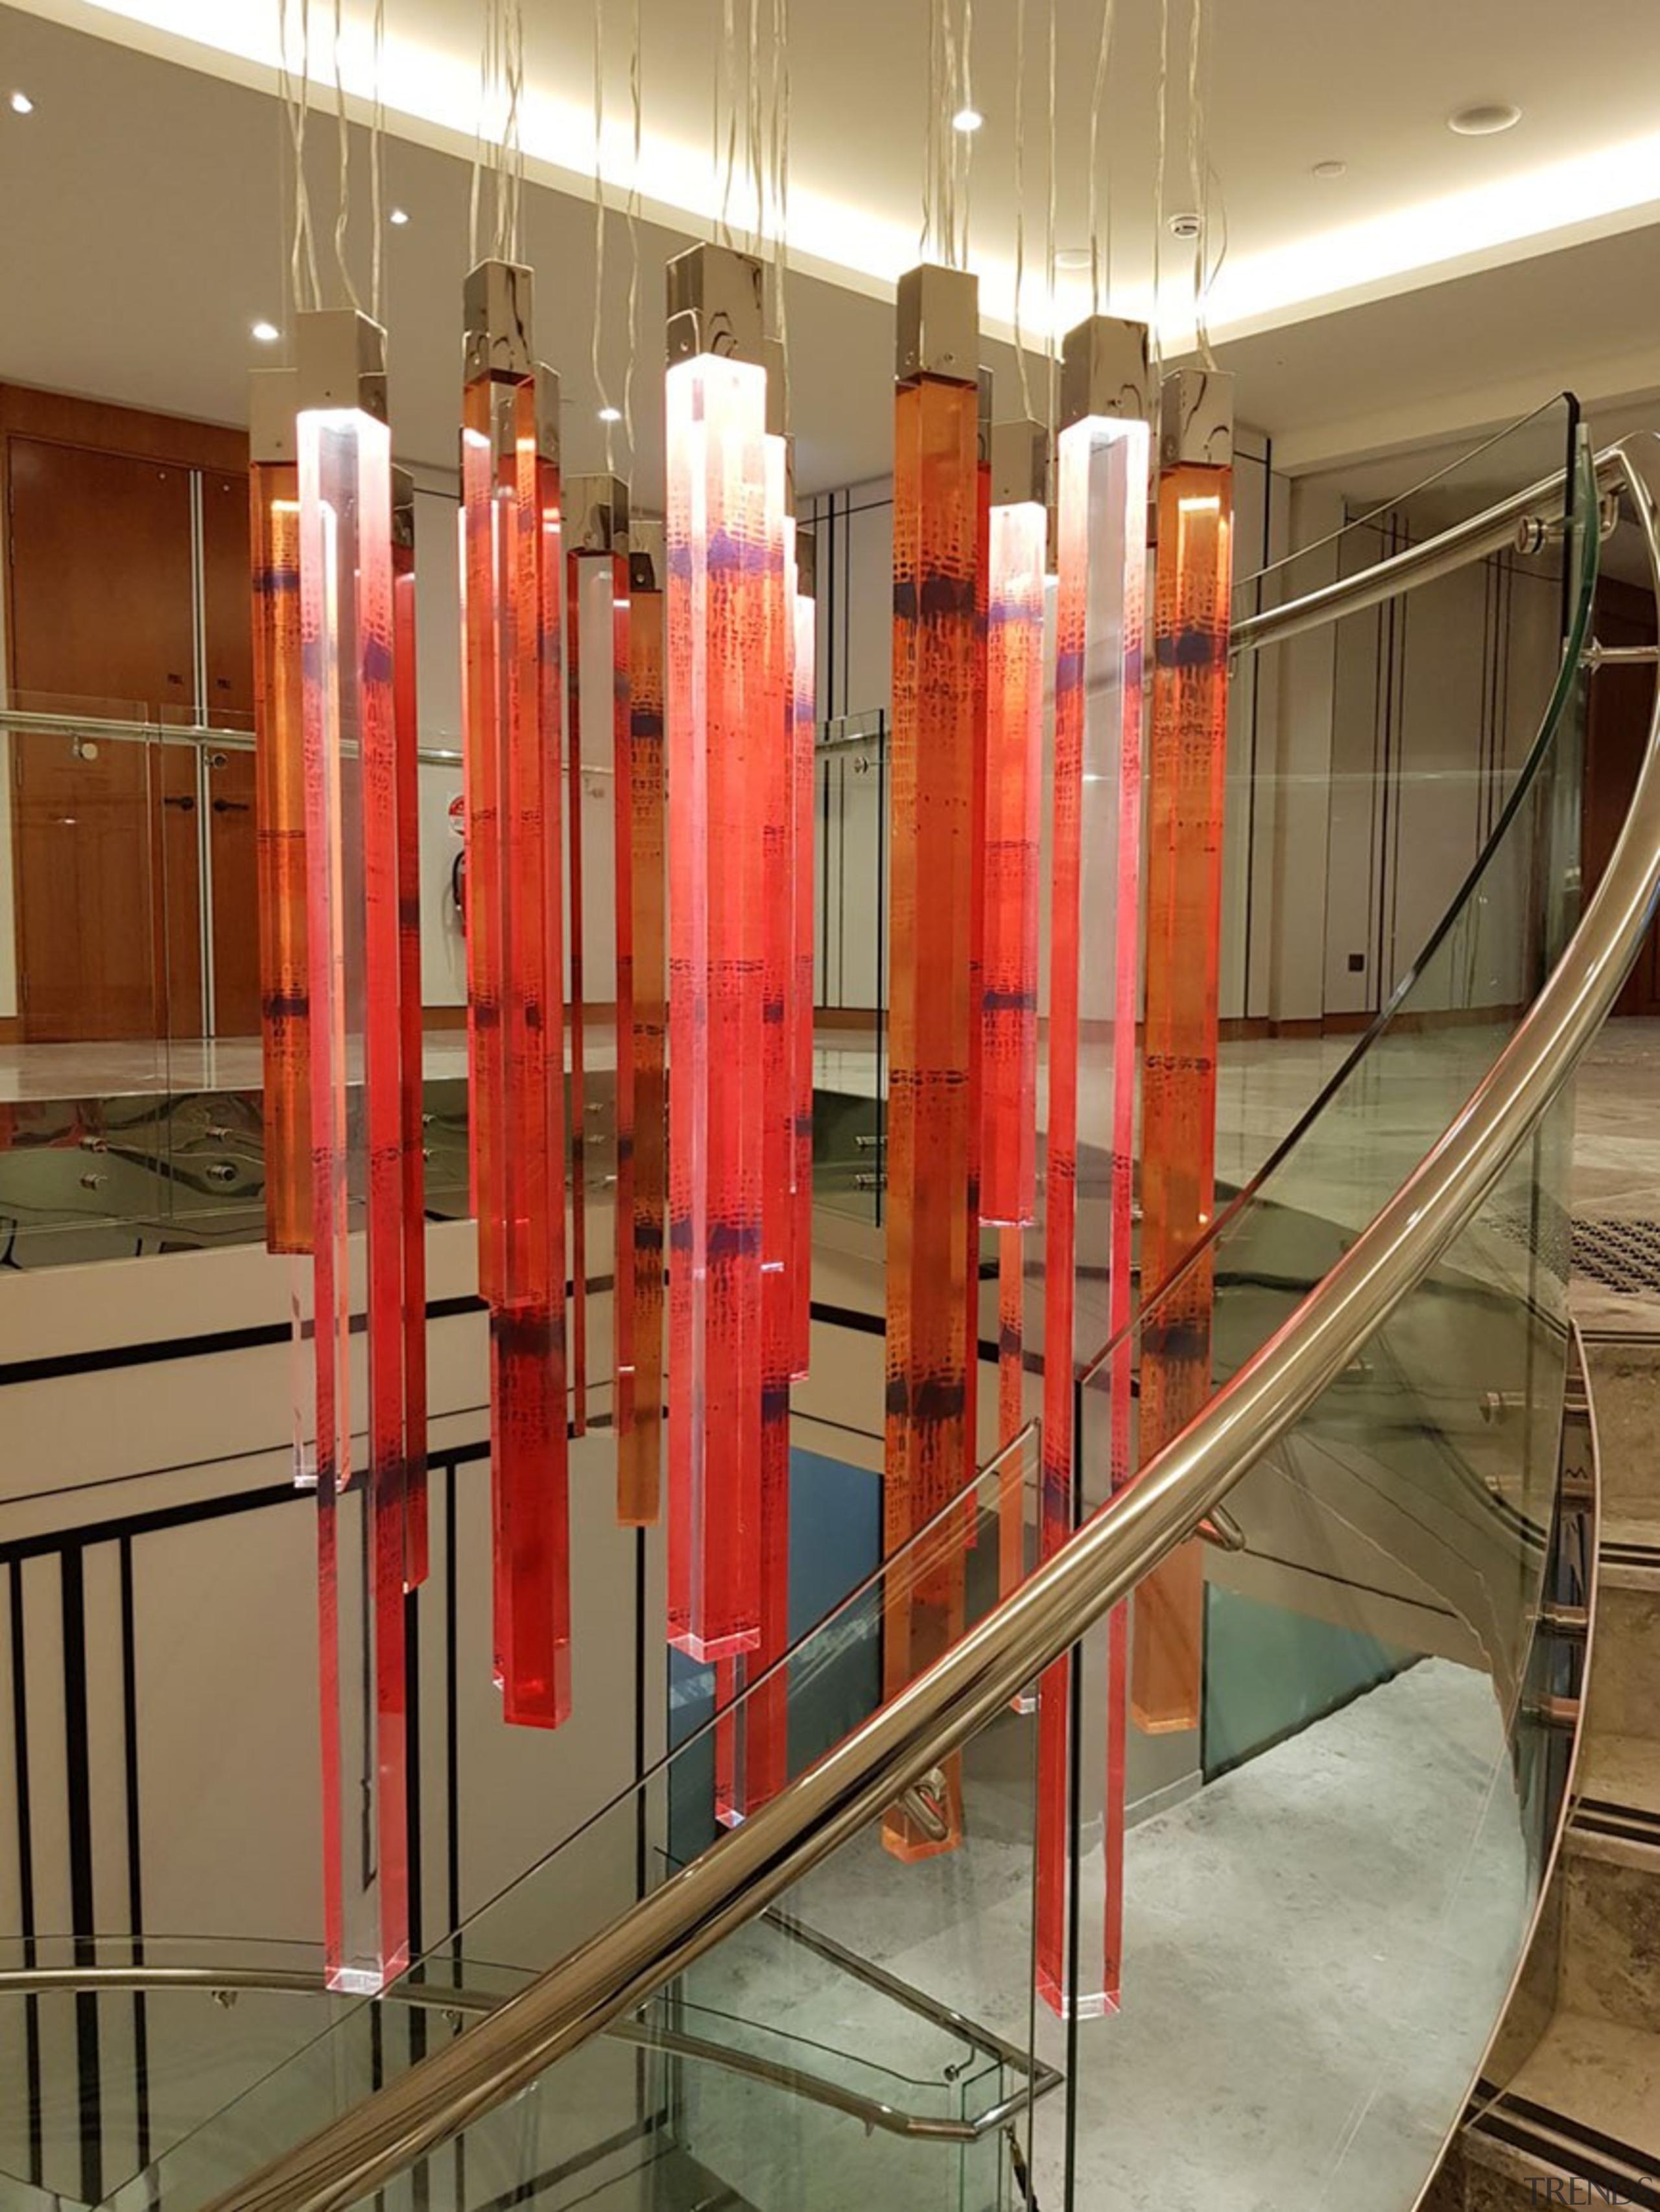 Doubletree Hilton 2 - architecture | building | architecture, building, floor, glass, room, brown